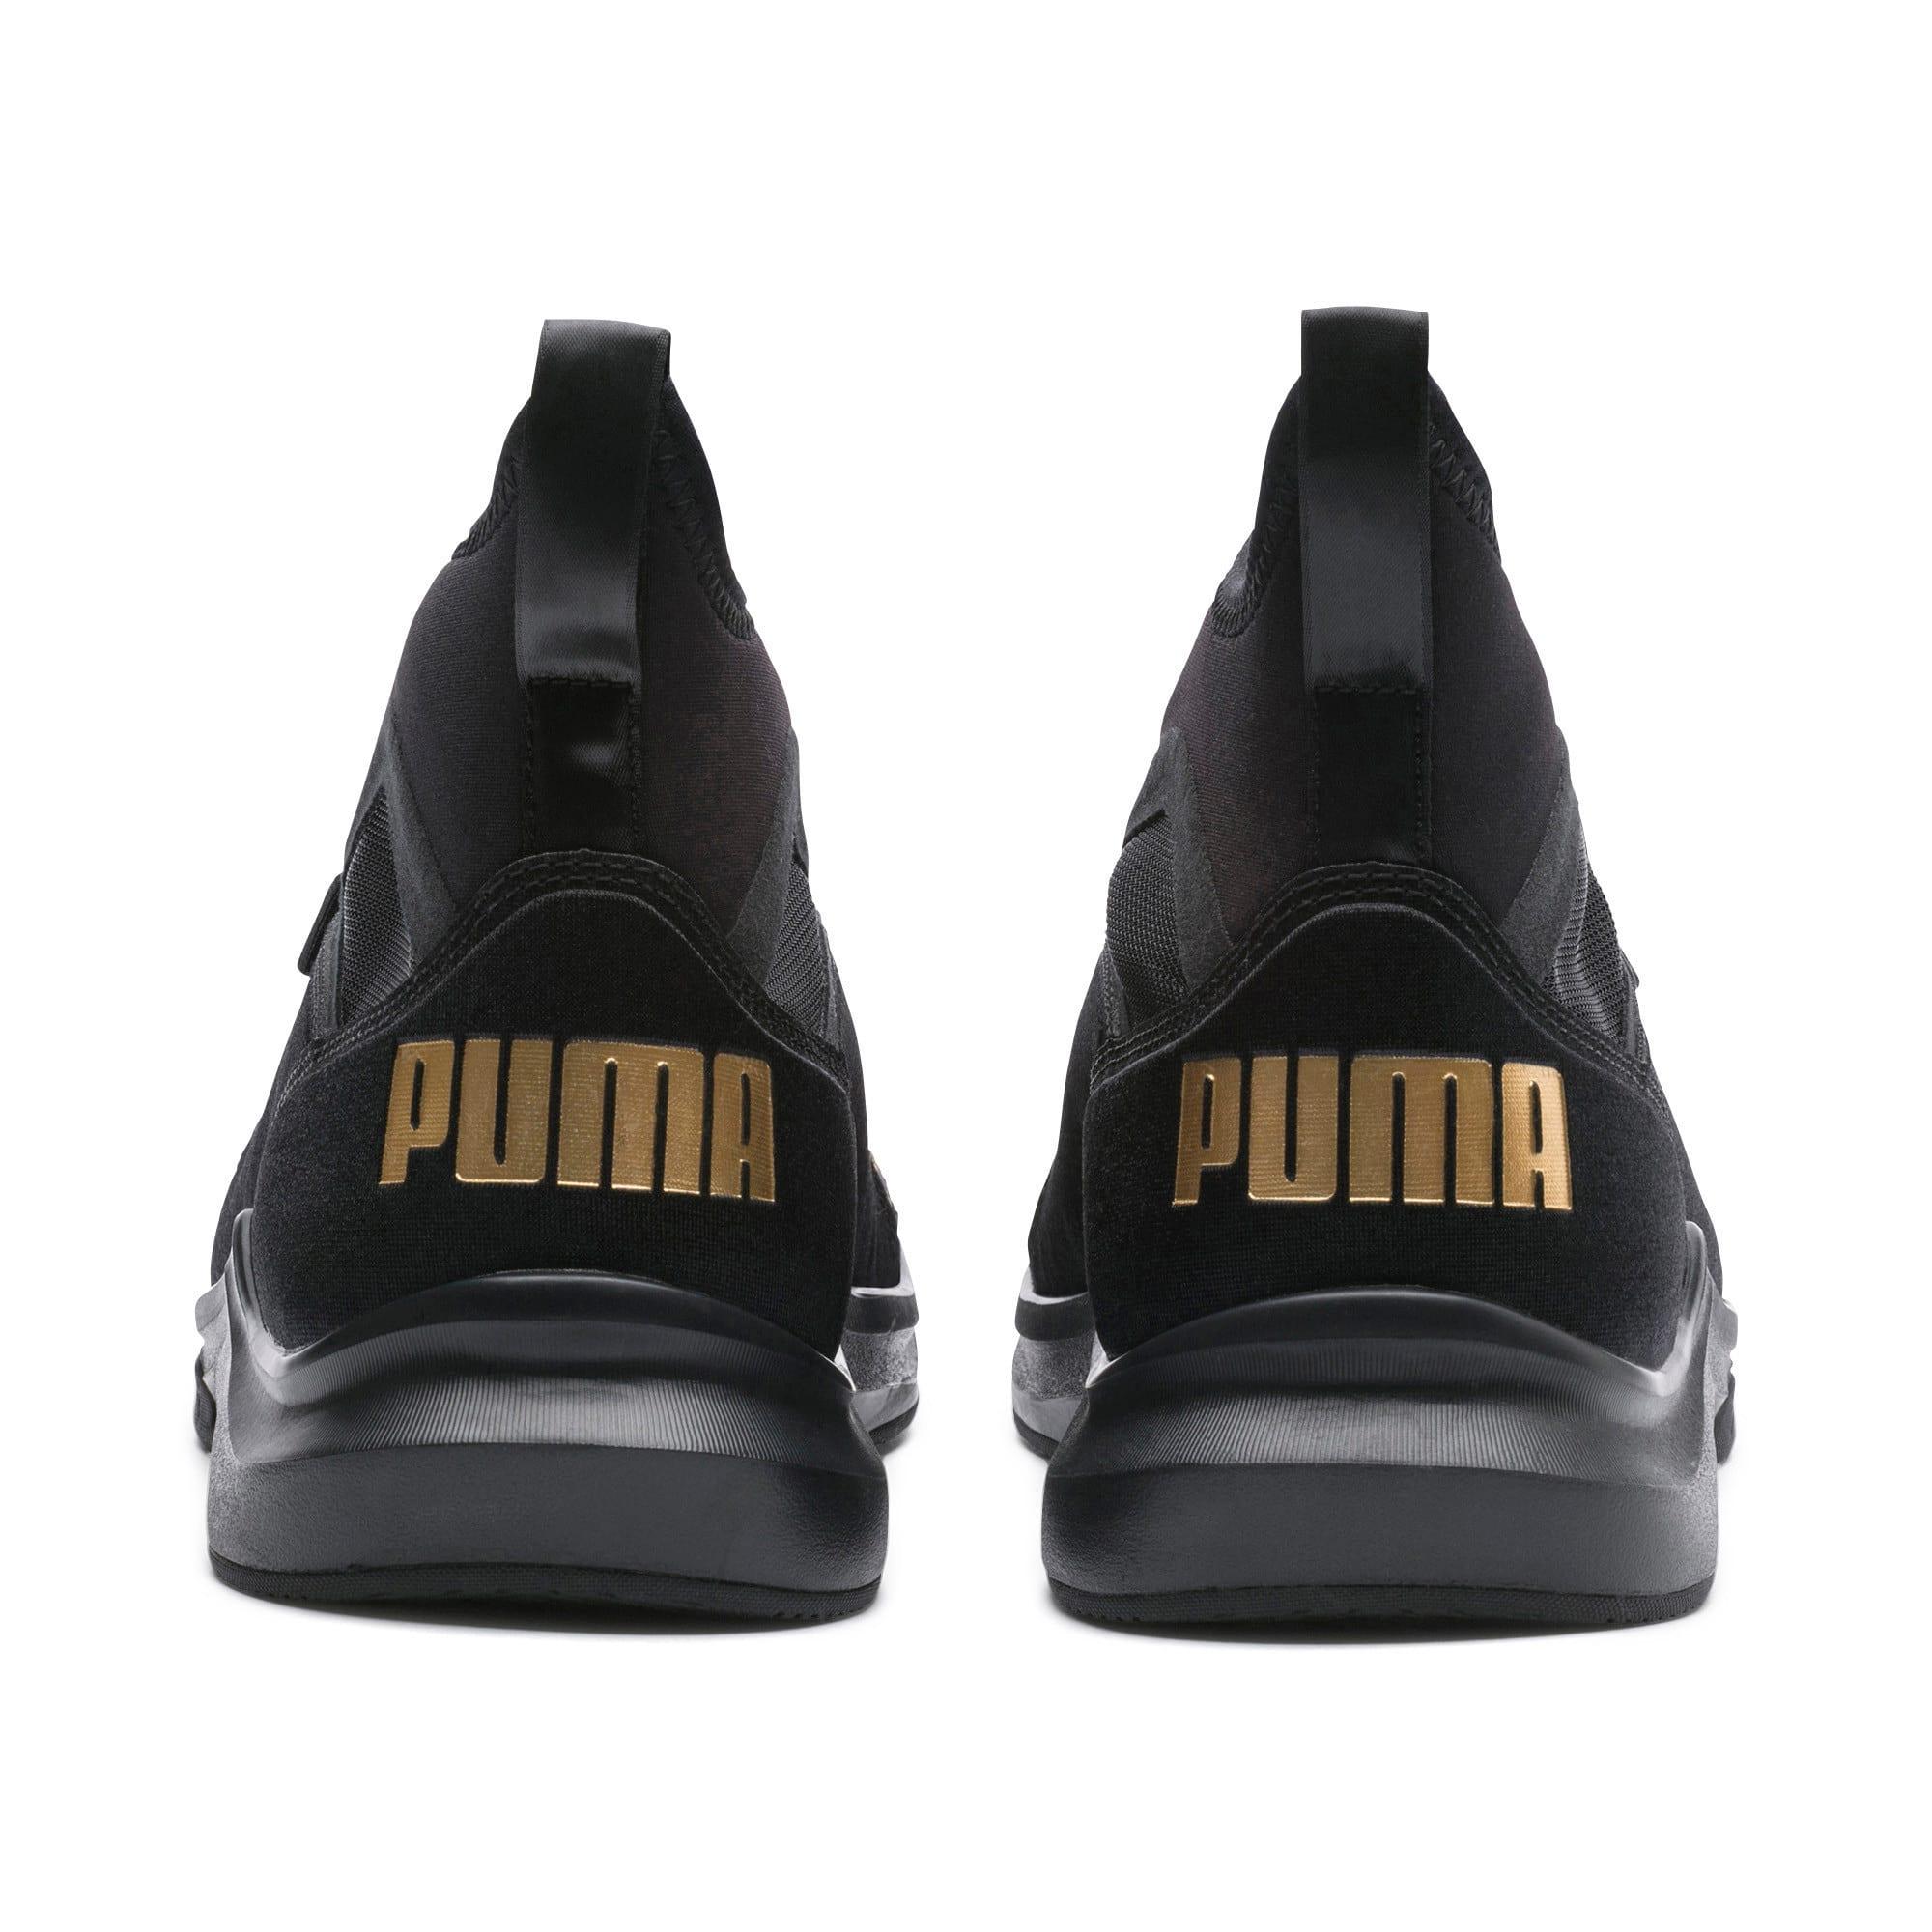 Thumbnail 5 of Phenom Varsity Women's Training Shoes, Puma Black-Puma Black, medium-IND